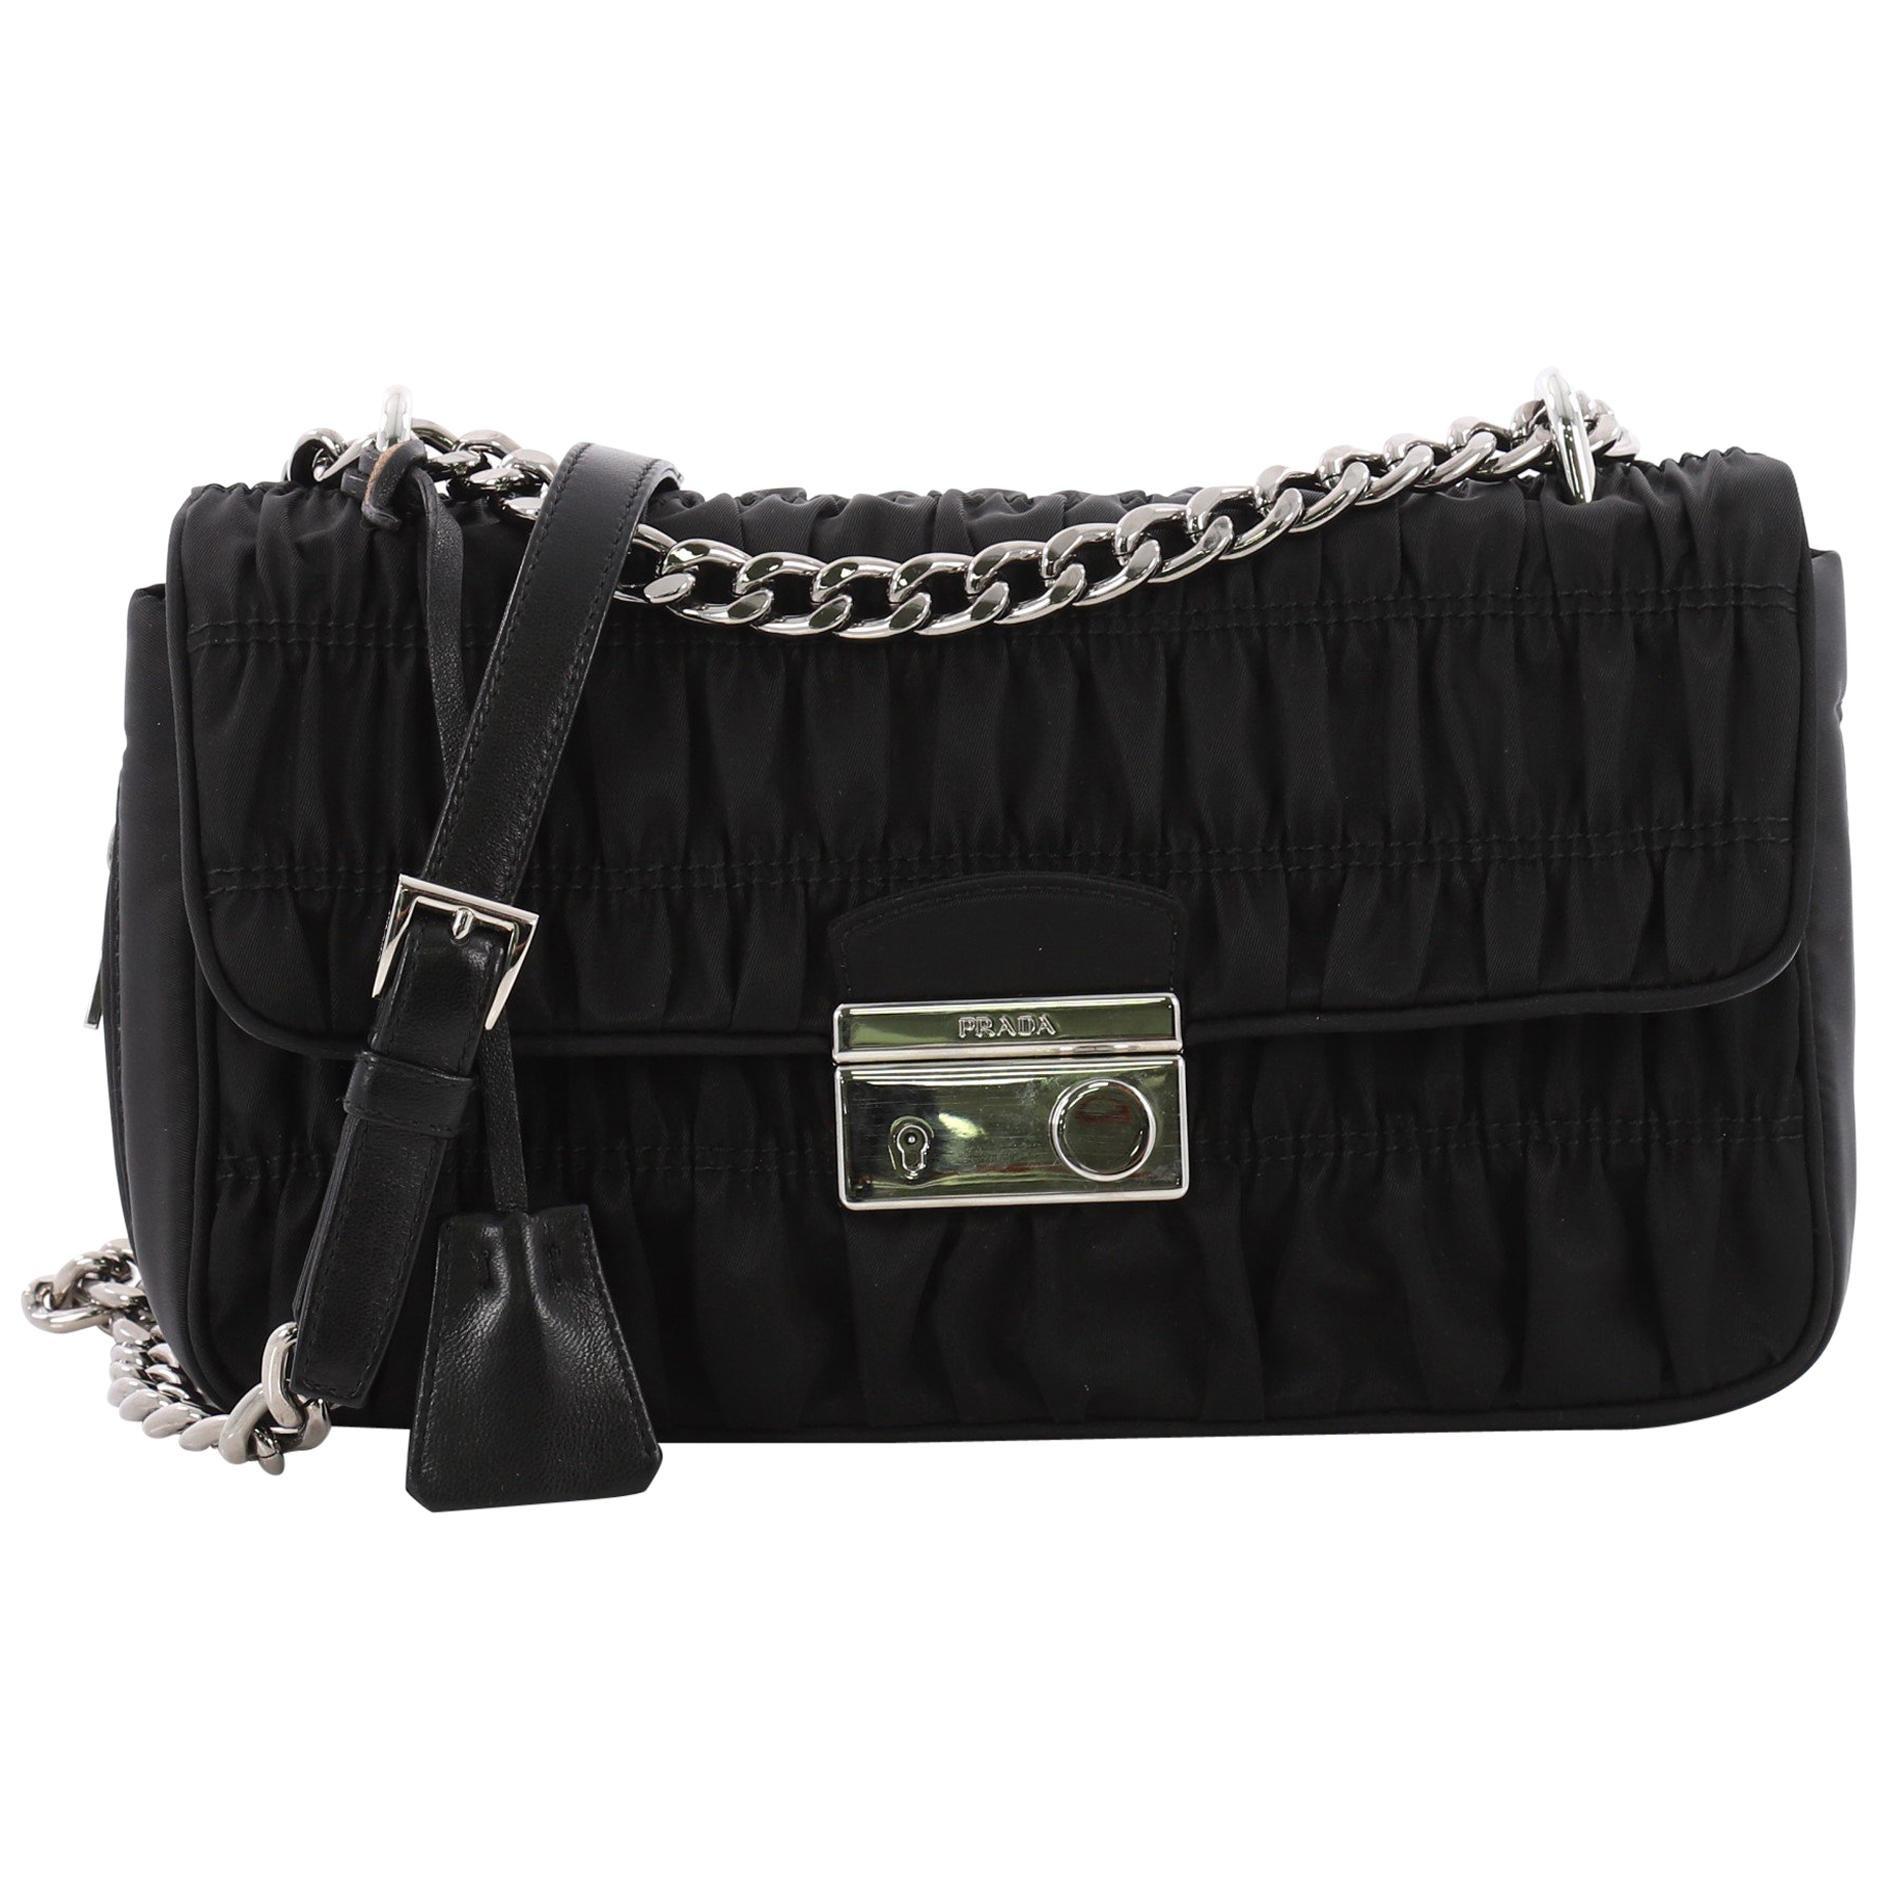 ecb8676fe094 ... low price vintage prada handbags and purses 503 for sale at 1stdibs  adeb8 9586d